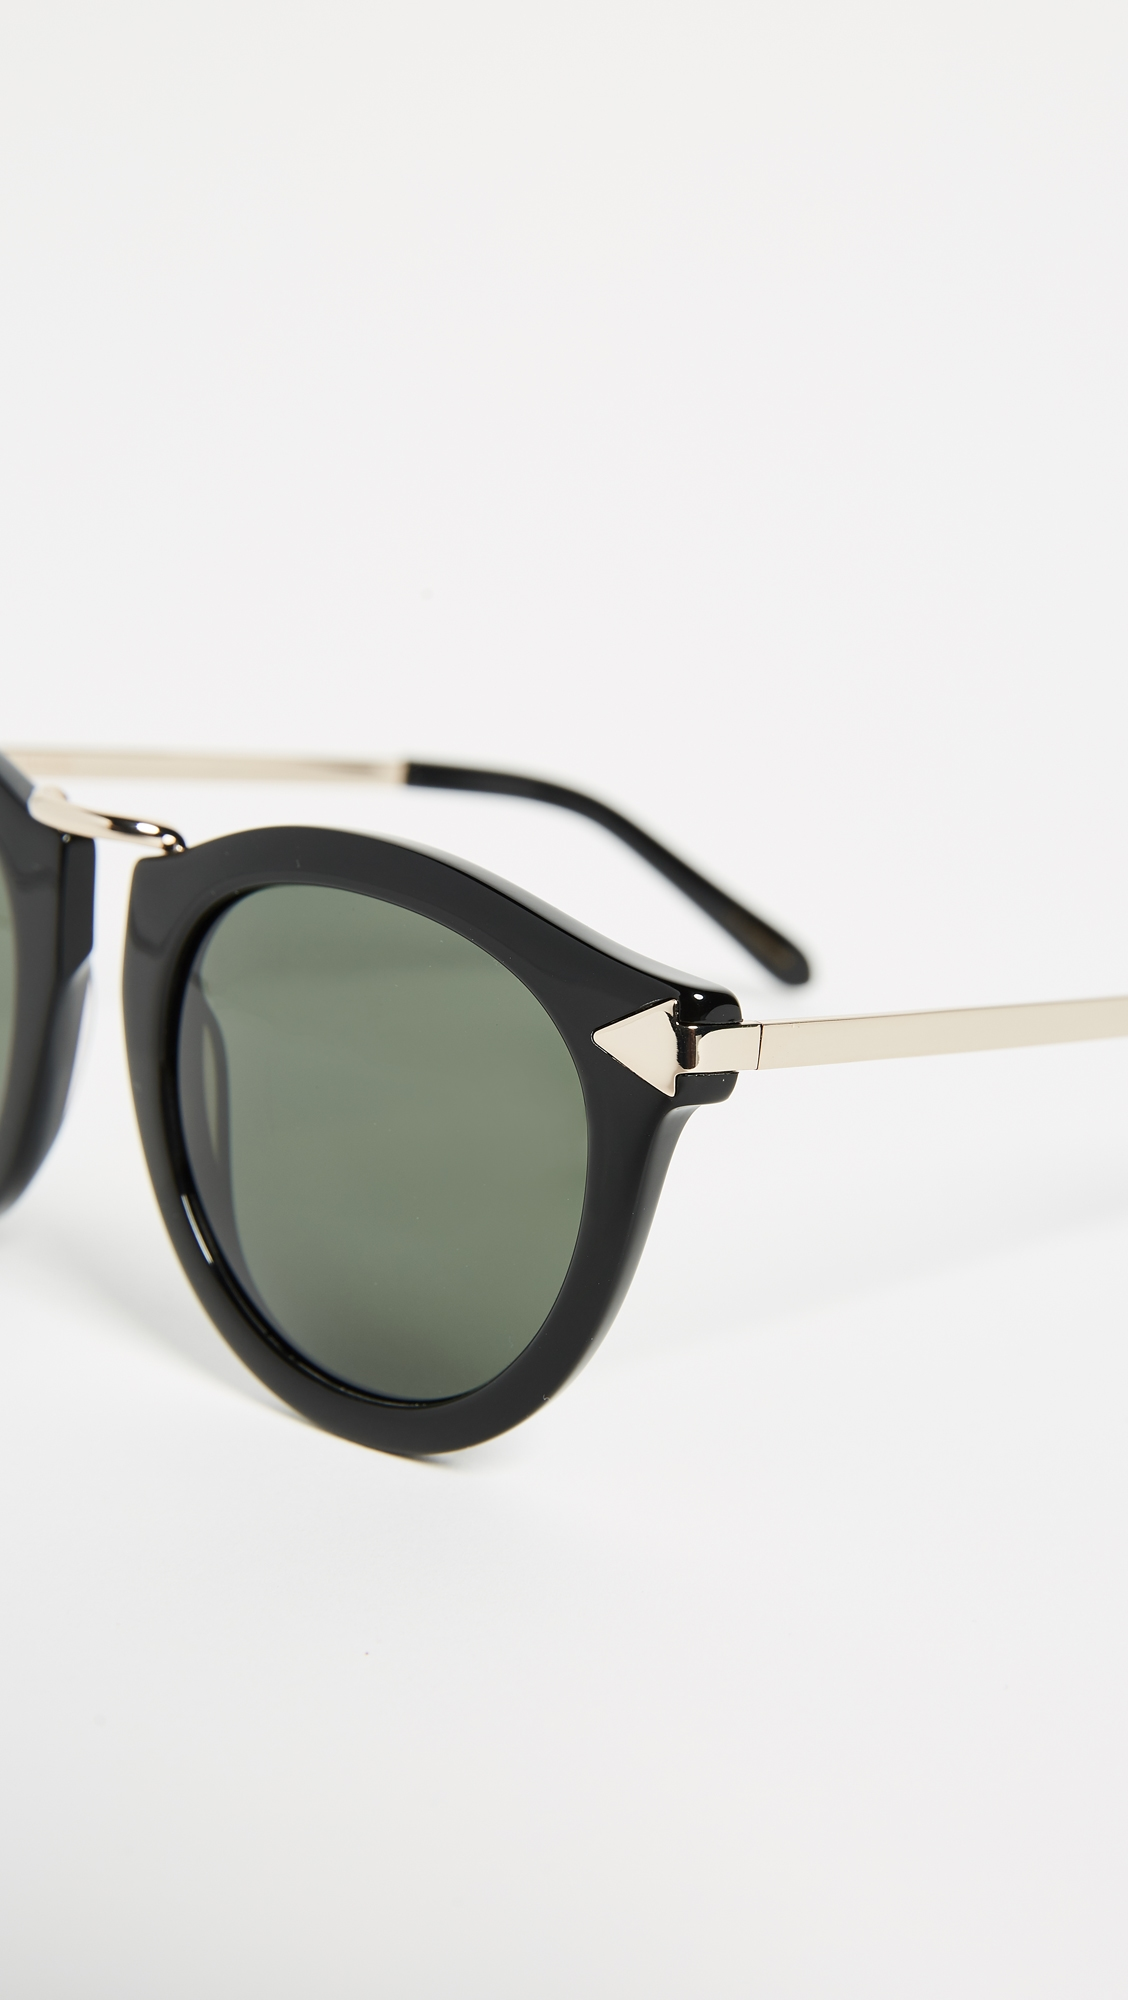 Солнцезащитные очки Harvest Karen Walker  (KWALK4005512867314)